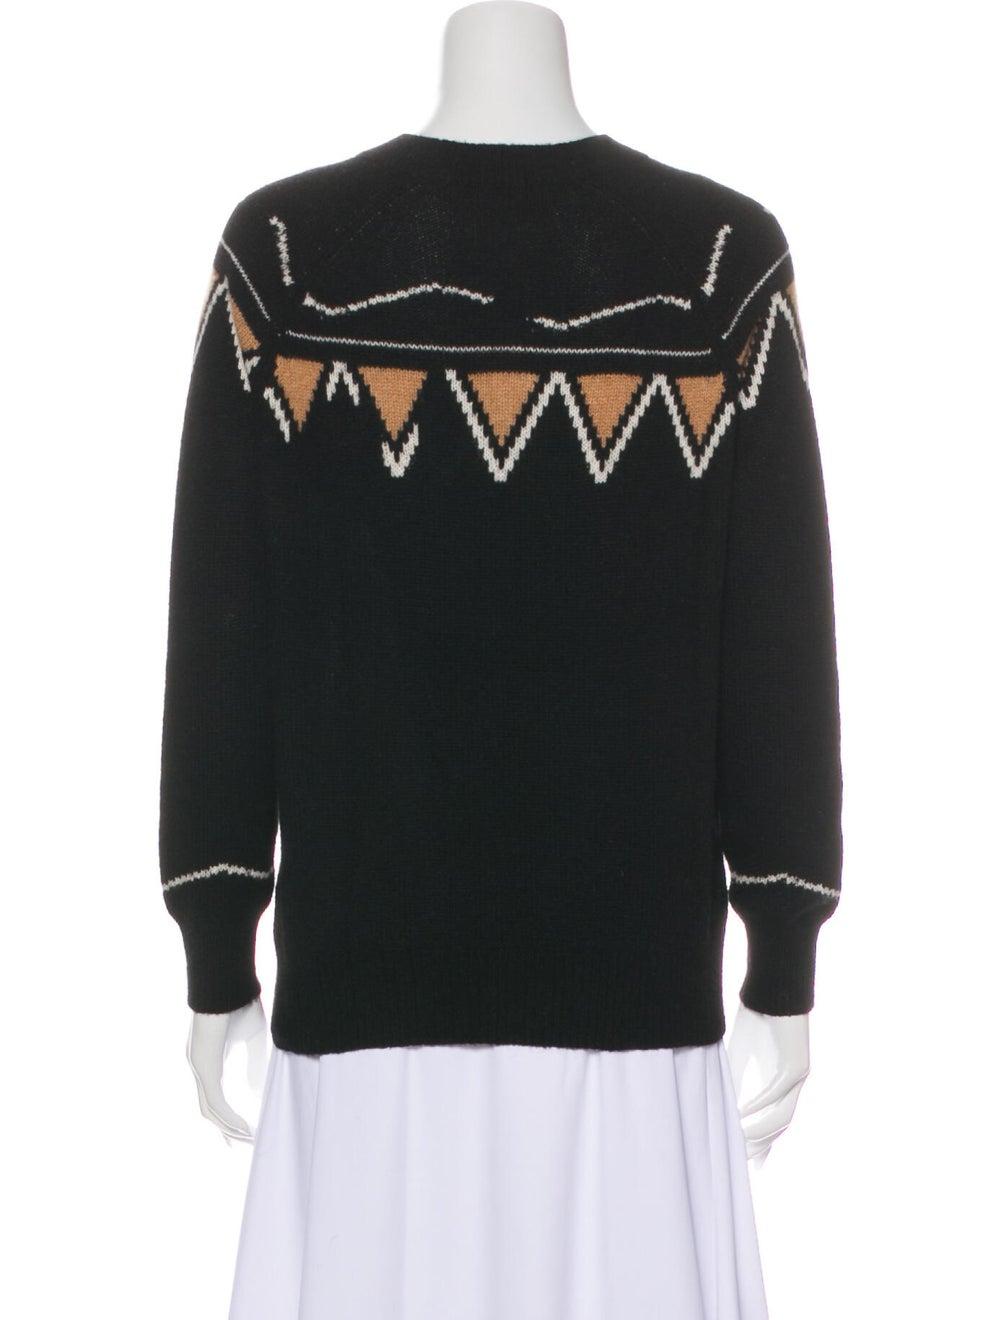 360 Cashmere Cashmere Patterned Sweater Black - image 3